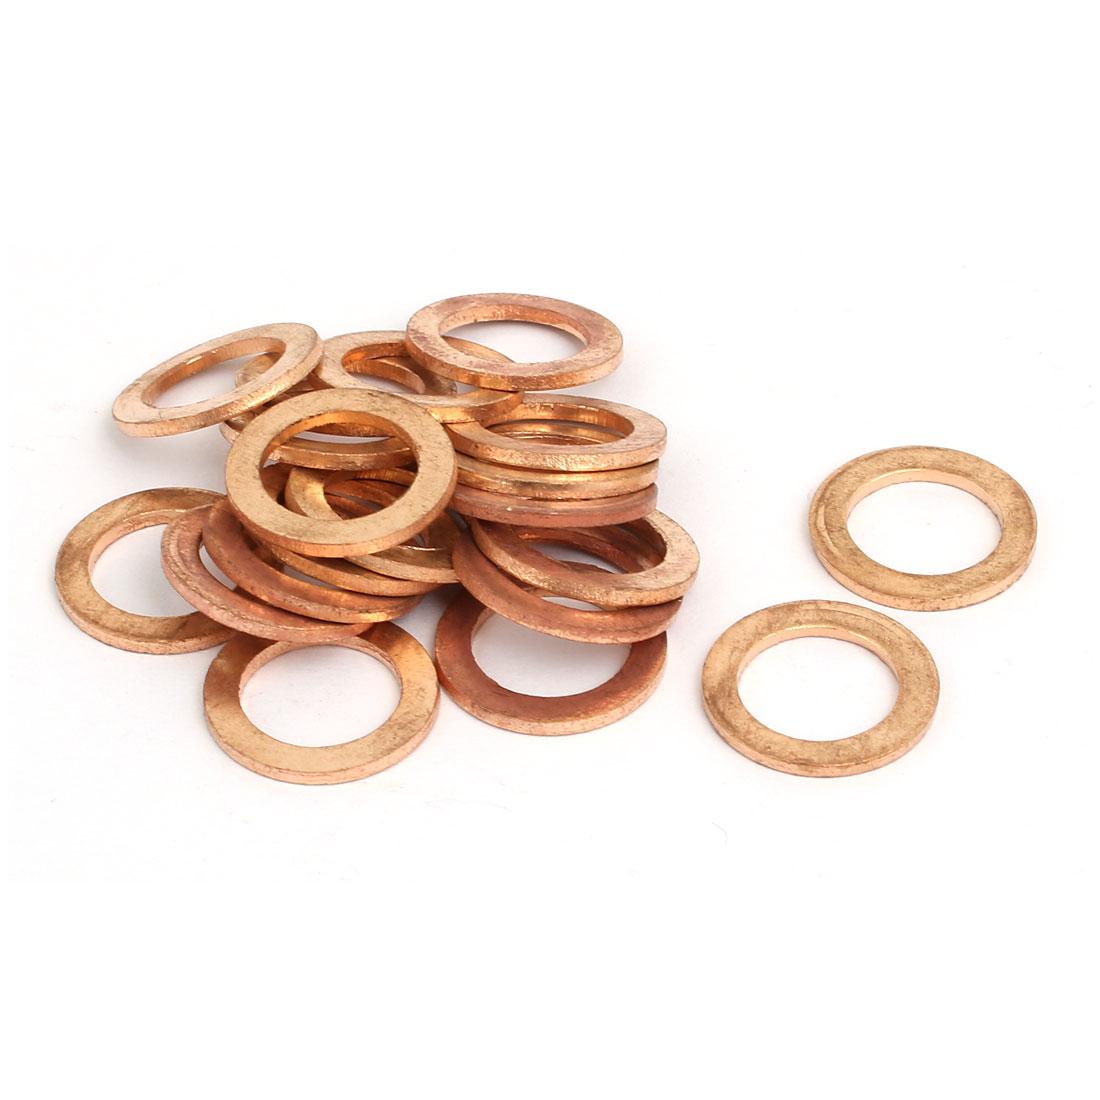 20pcs 12mmx20mmx1.5mm Copper Flat Ring Sealing Crush Washer Gasket